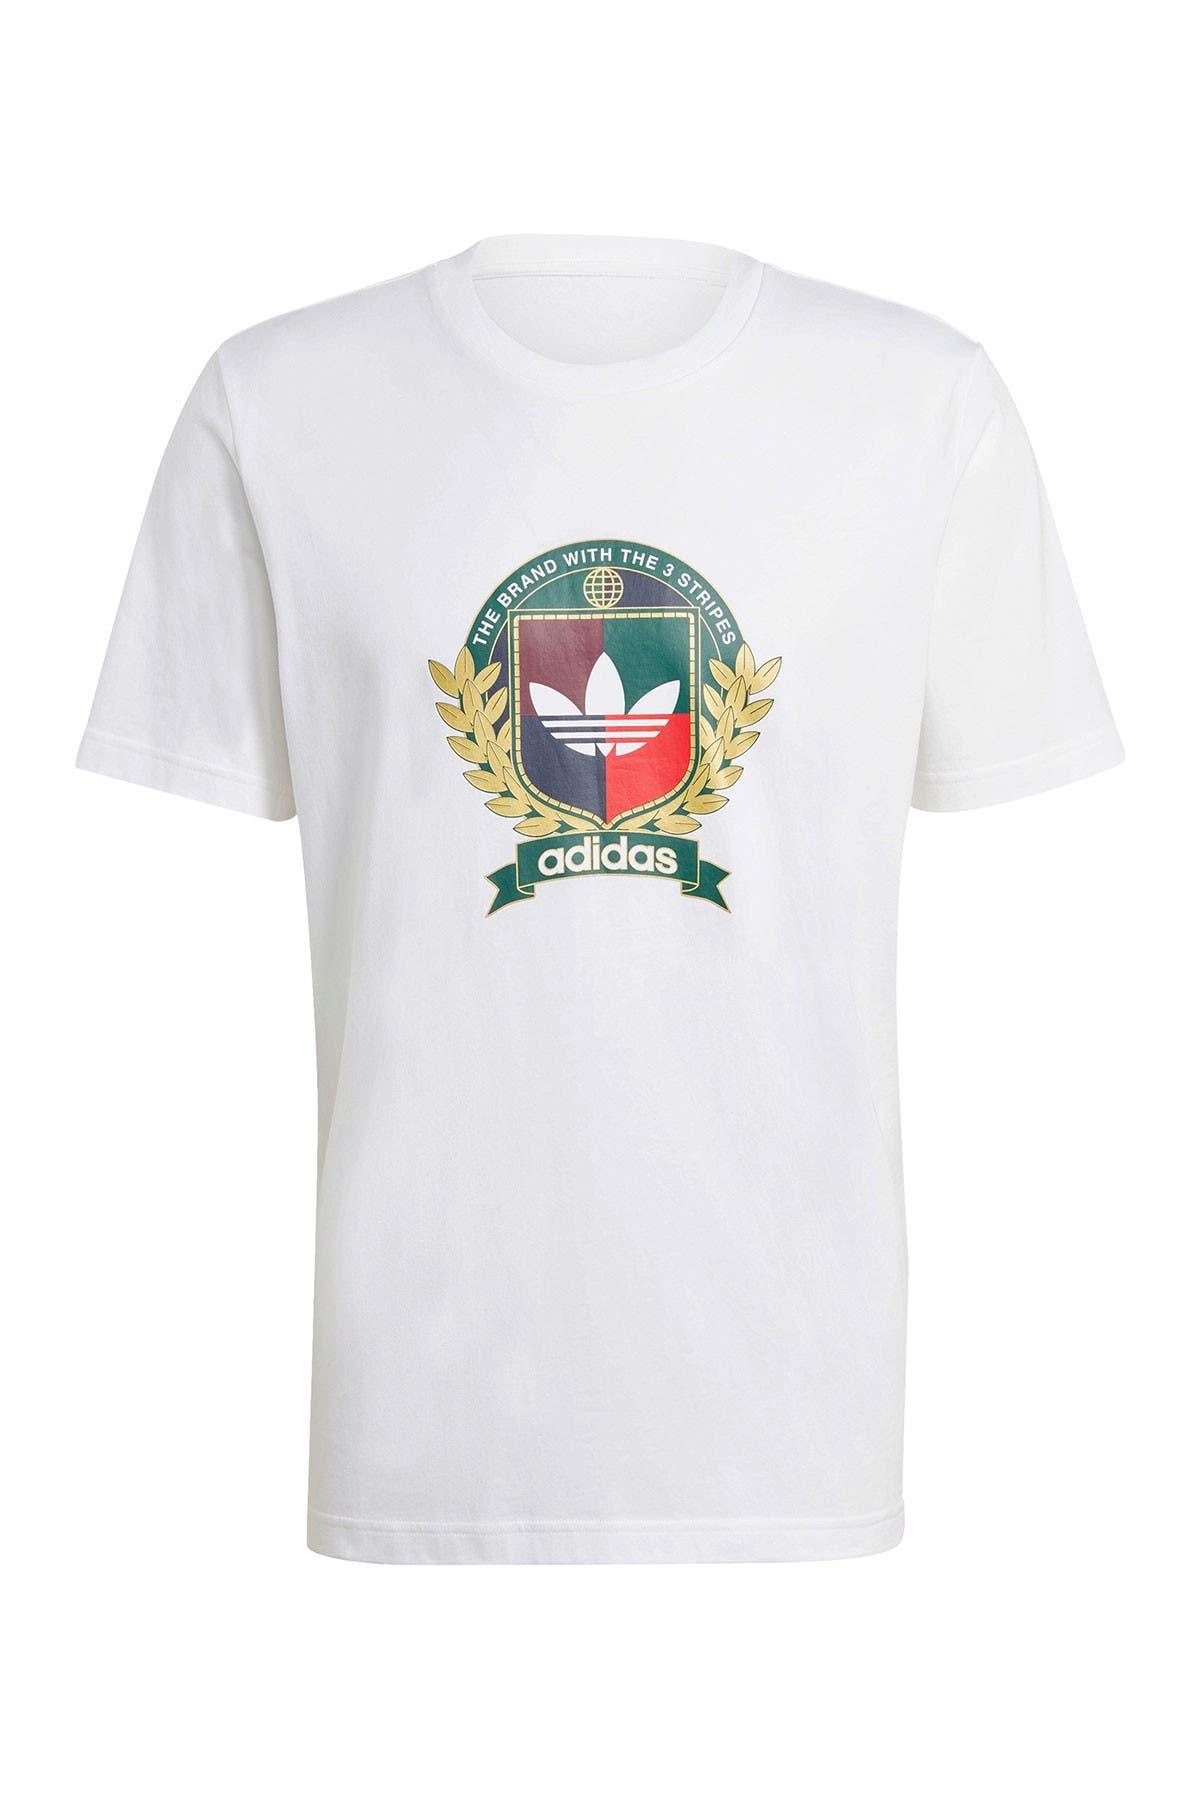 Image of adidas Crest T-Shirt